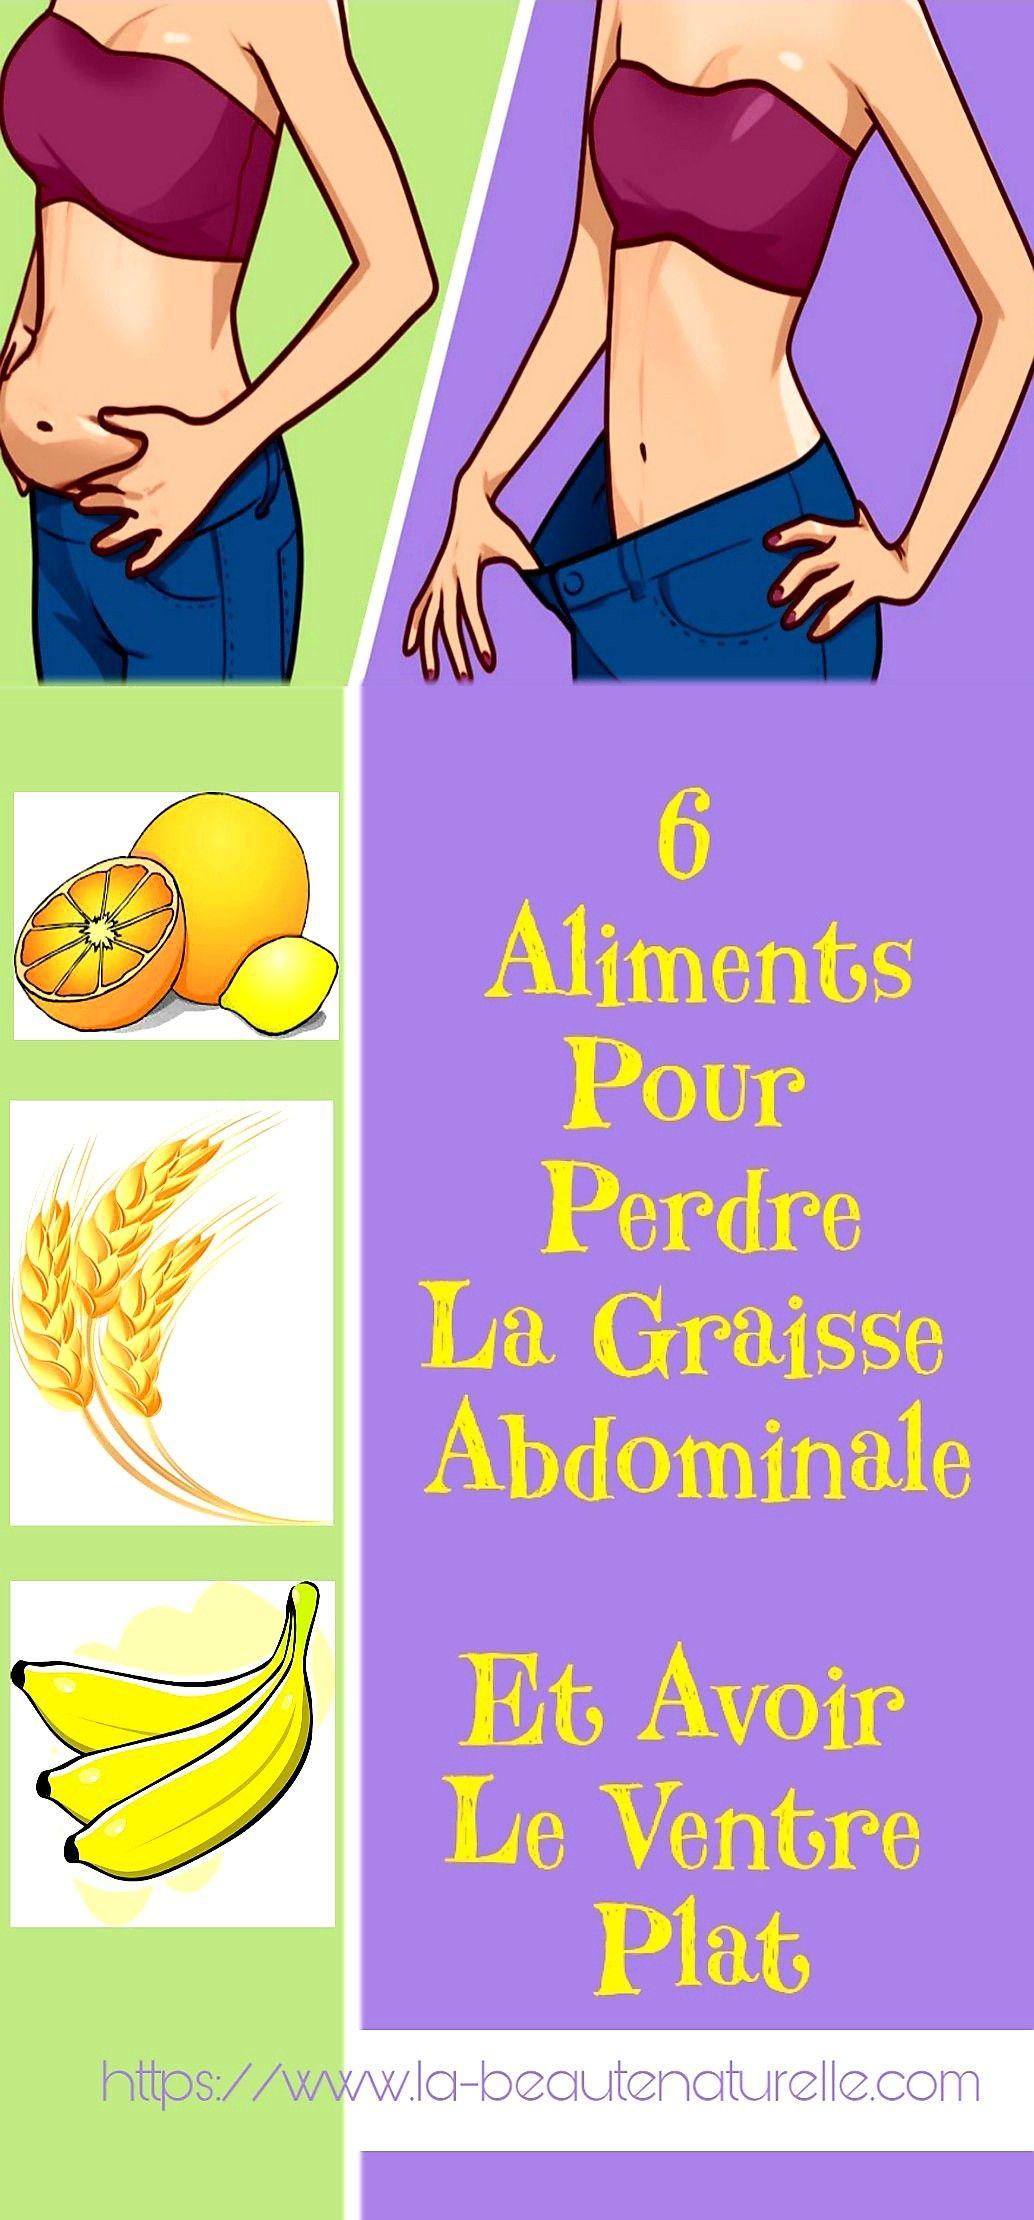 Ventre plat : 7 aliments à adopter - davidpicot.fr